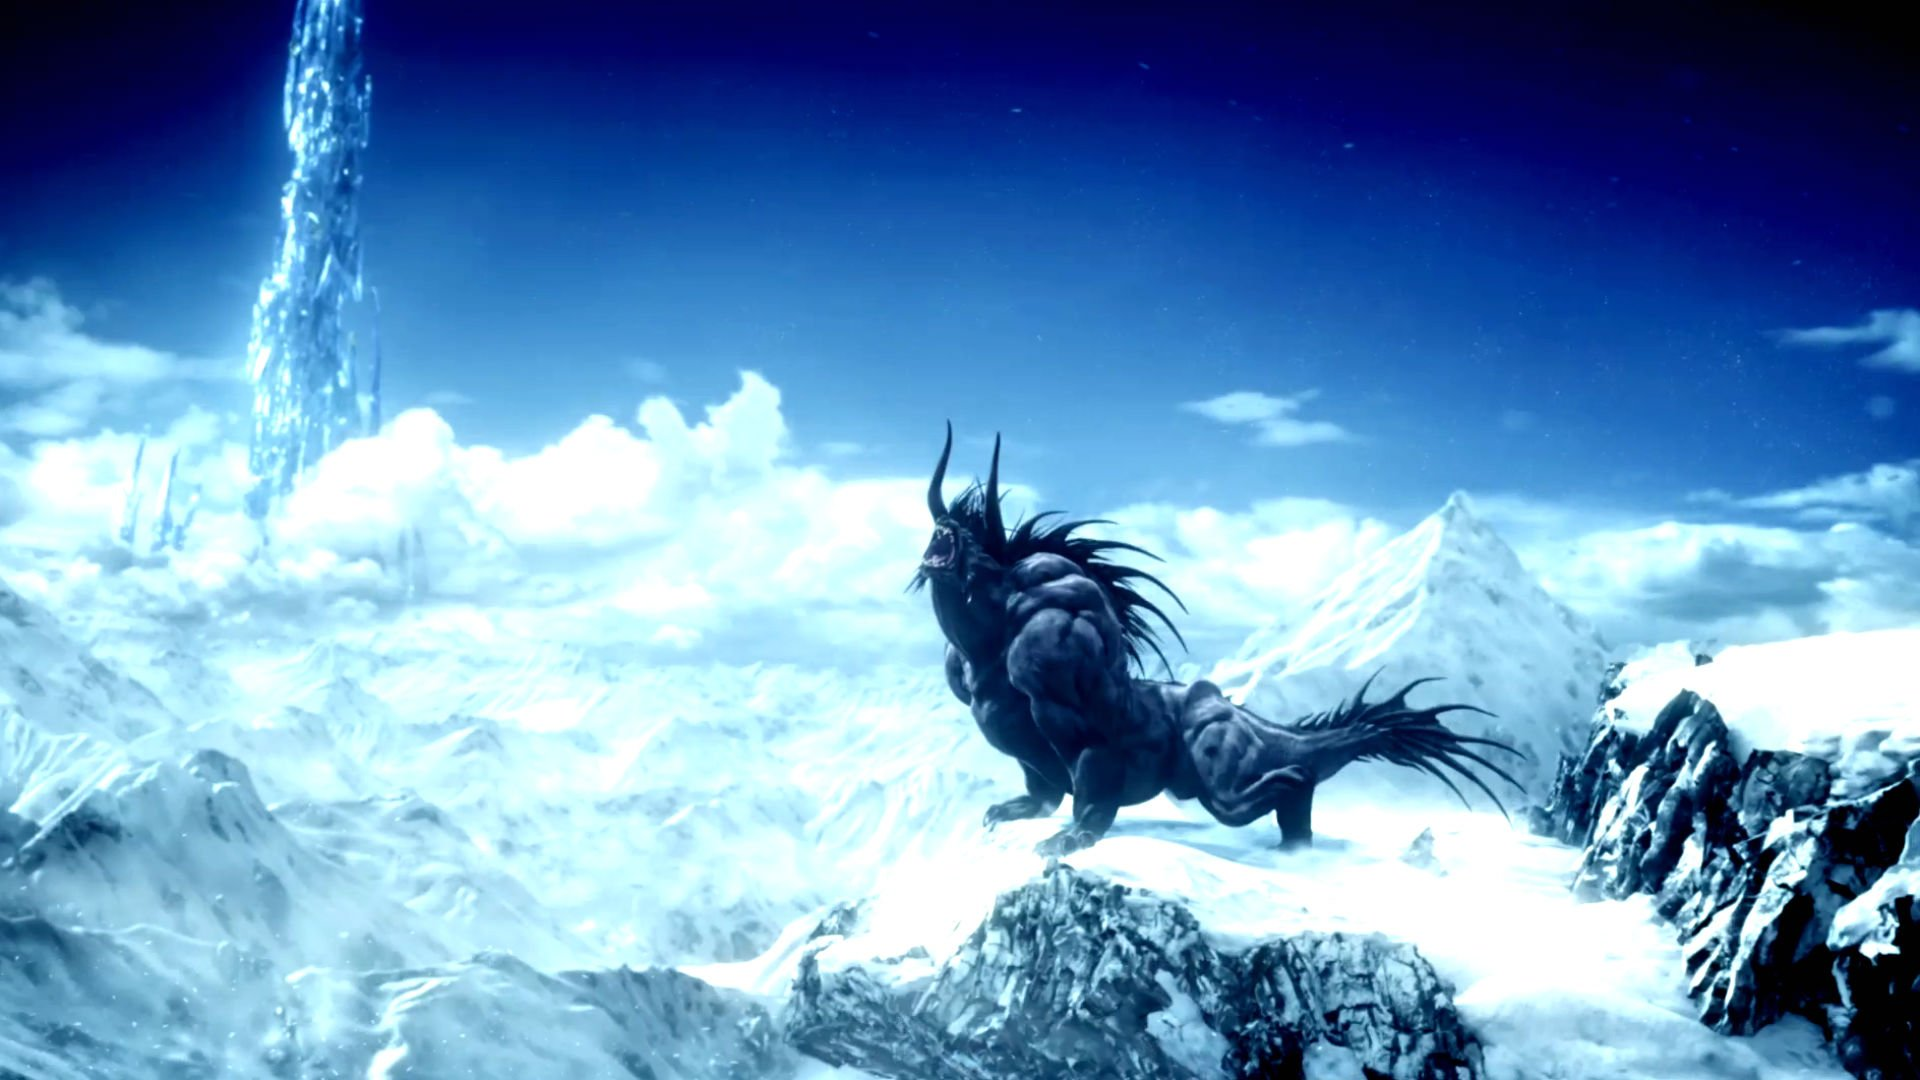 Final Fantasy Xiv A Realm Reborn Fantasy Art Wallpapers: FINAL FANTASY XIV Realm Reborn Game Adventure Online (107